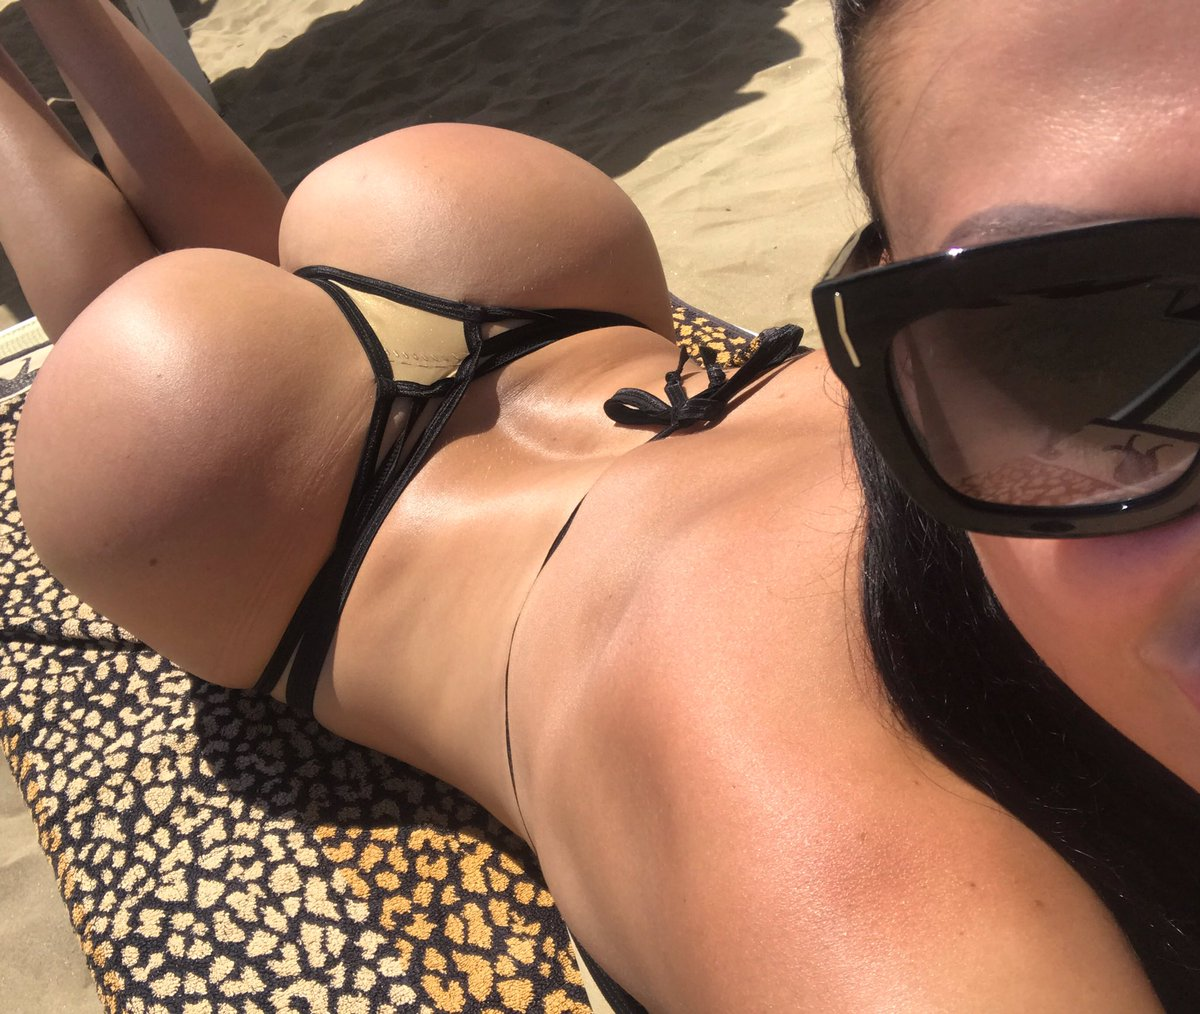 Aletta Ocean-pornstar  - Sunburn is o twitter @ALETTAOCEANXXXX